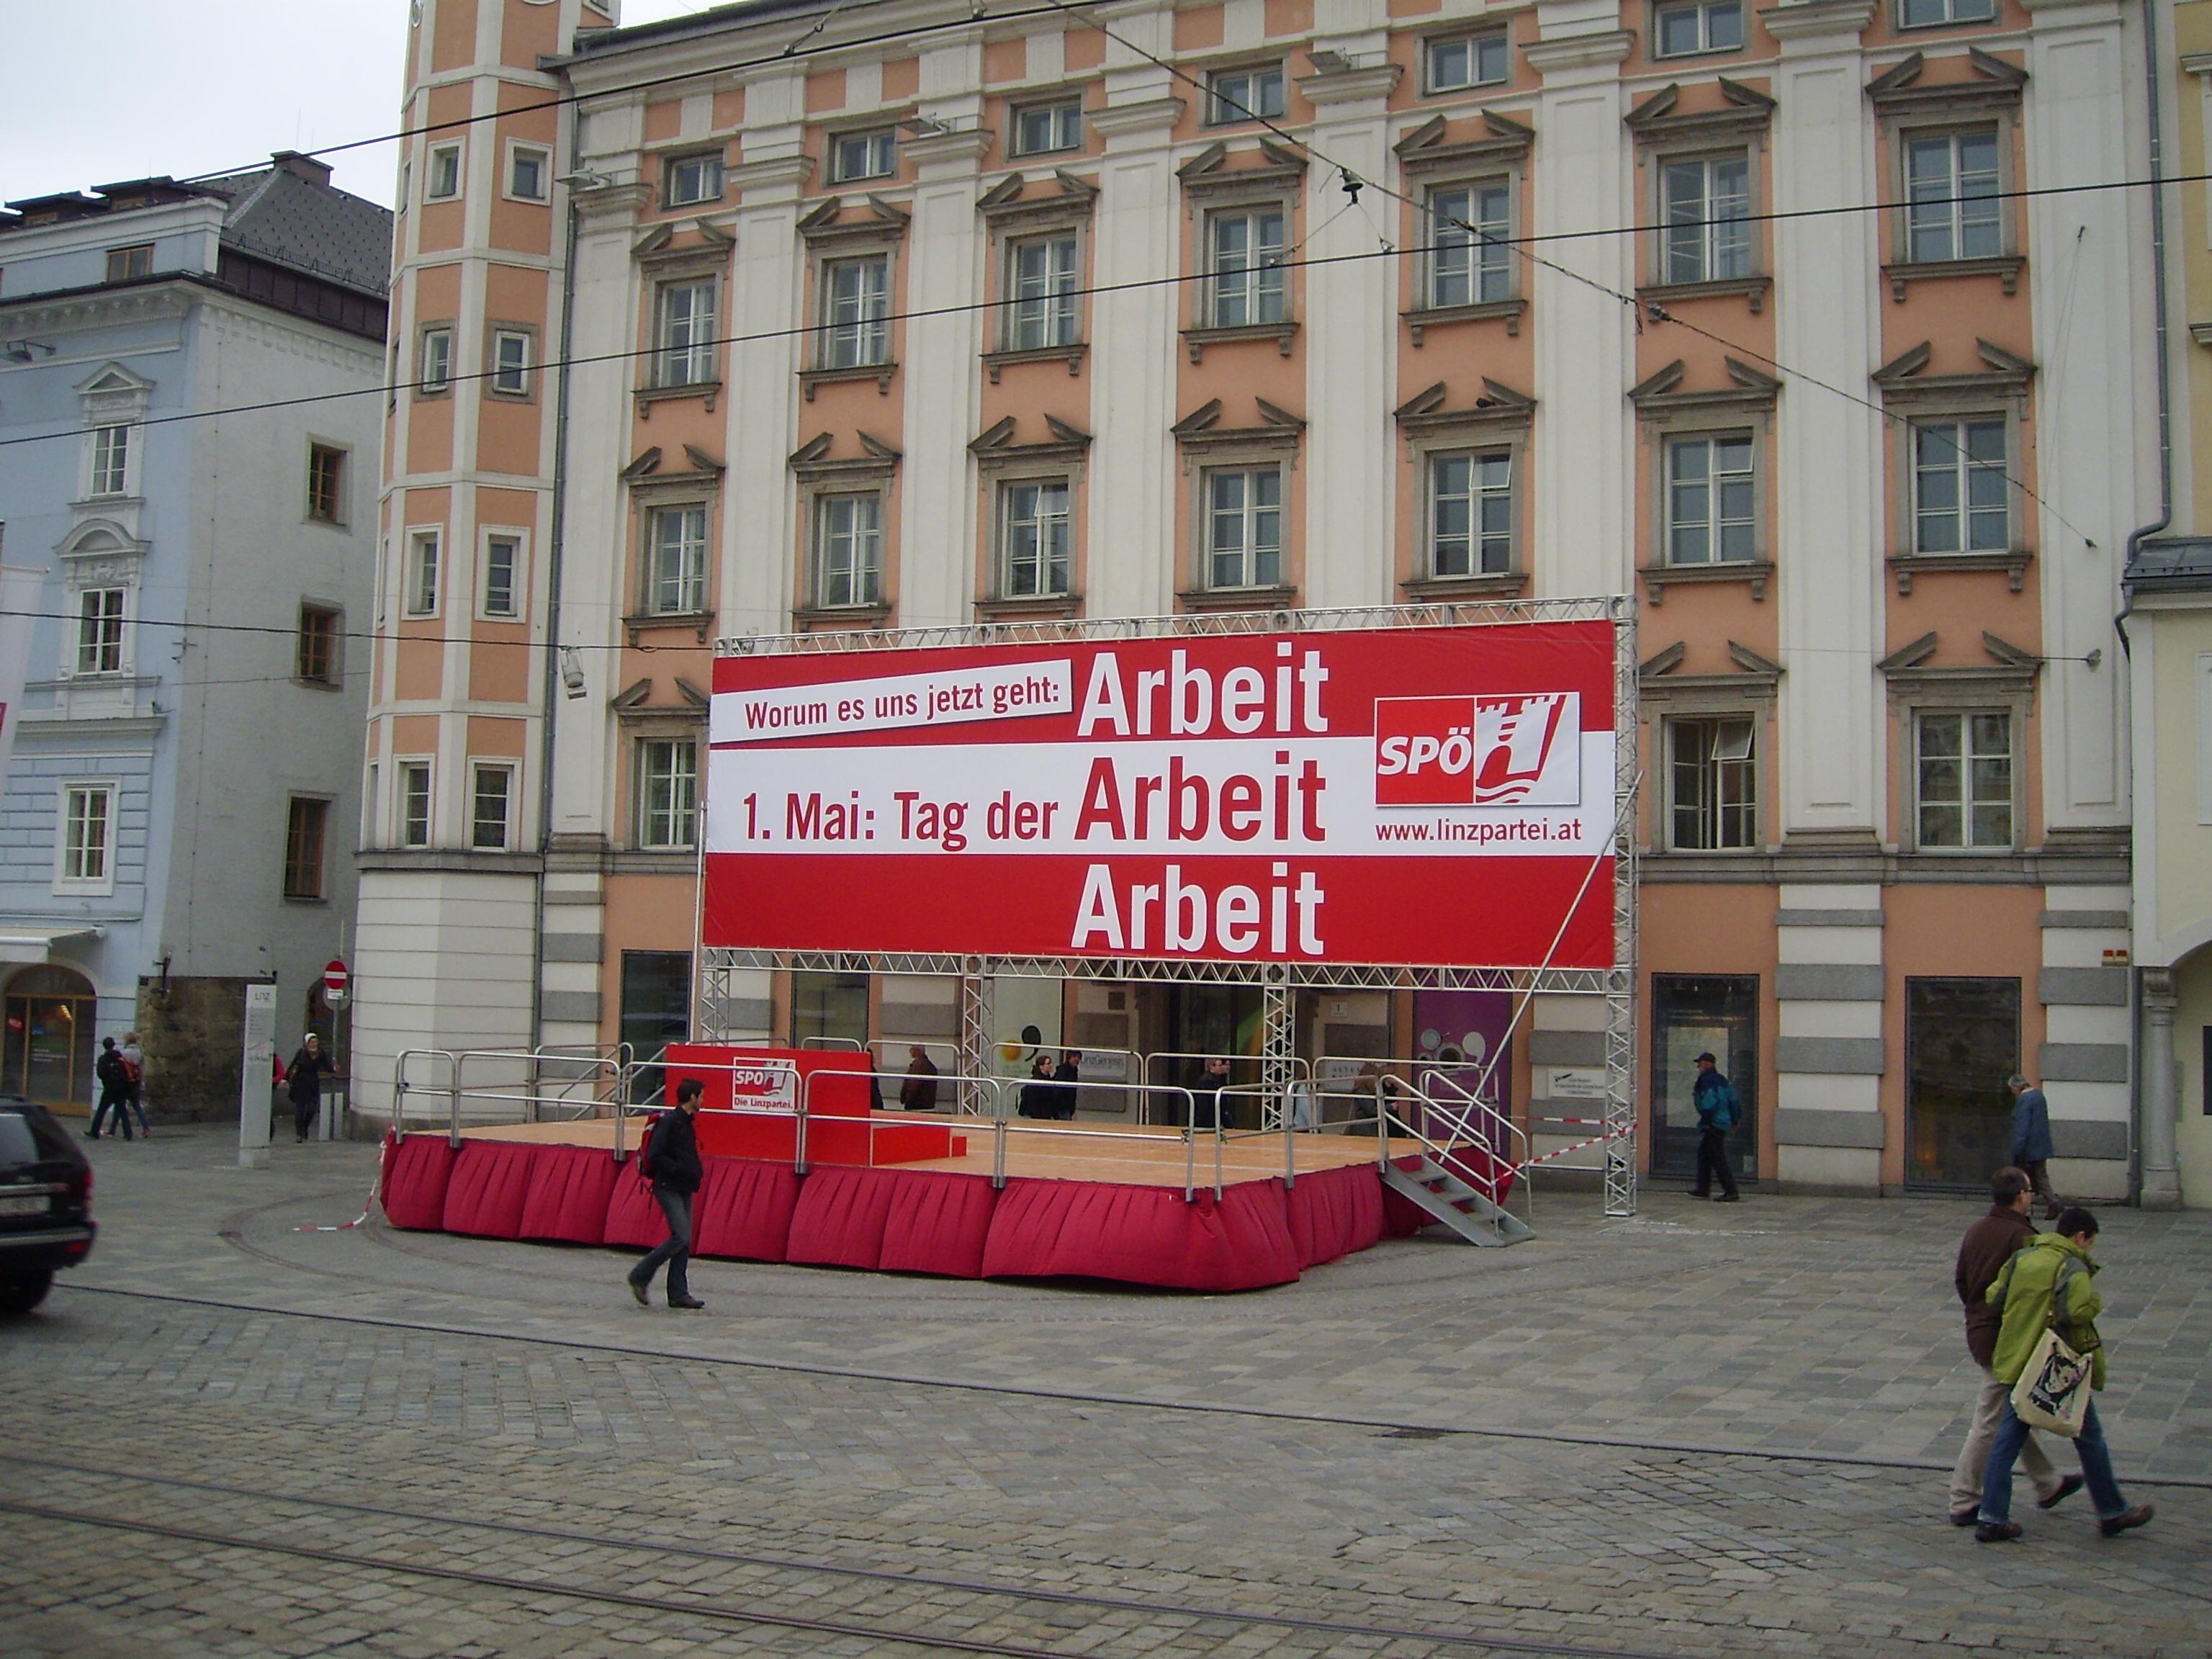 SPÖ 1. Mai Kundgebung